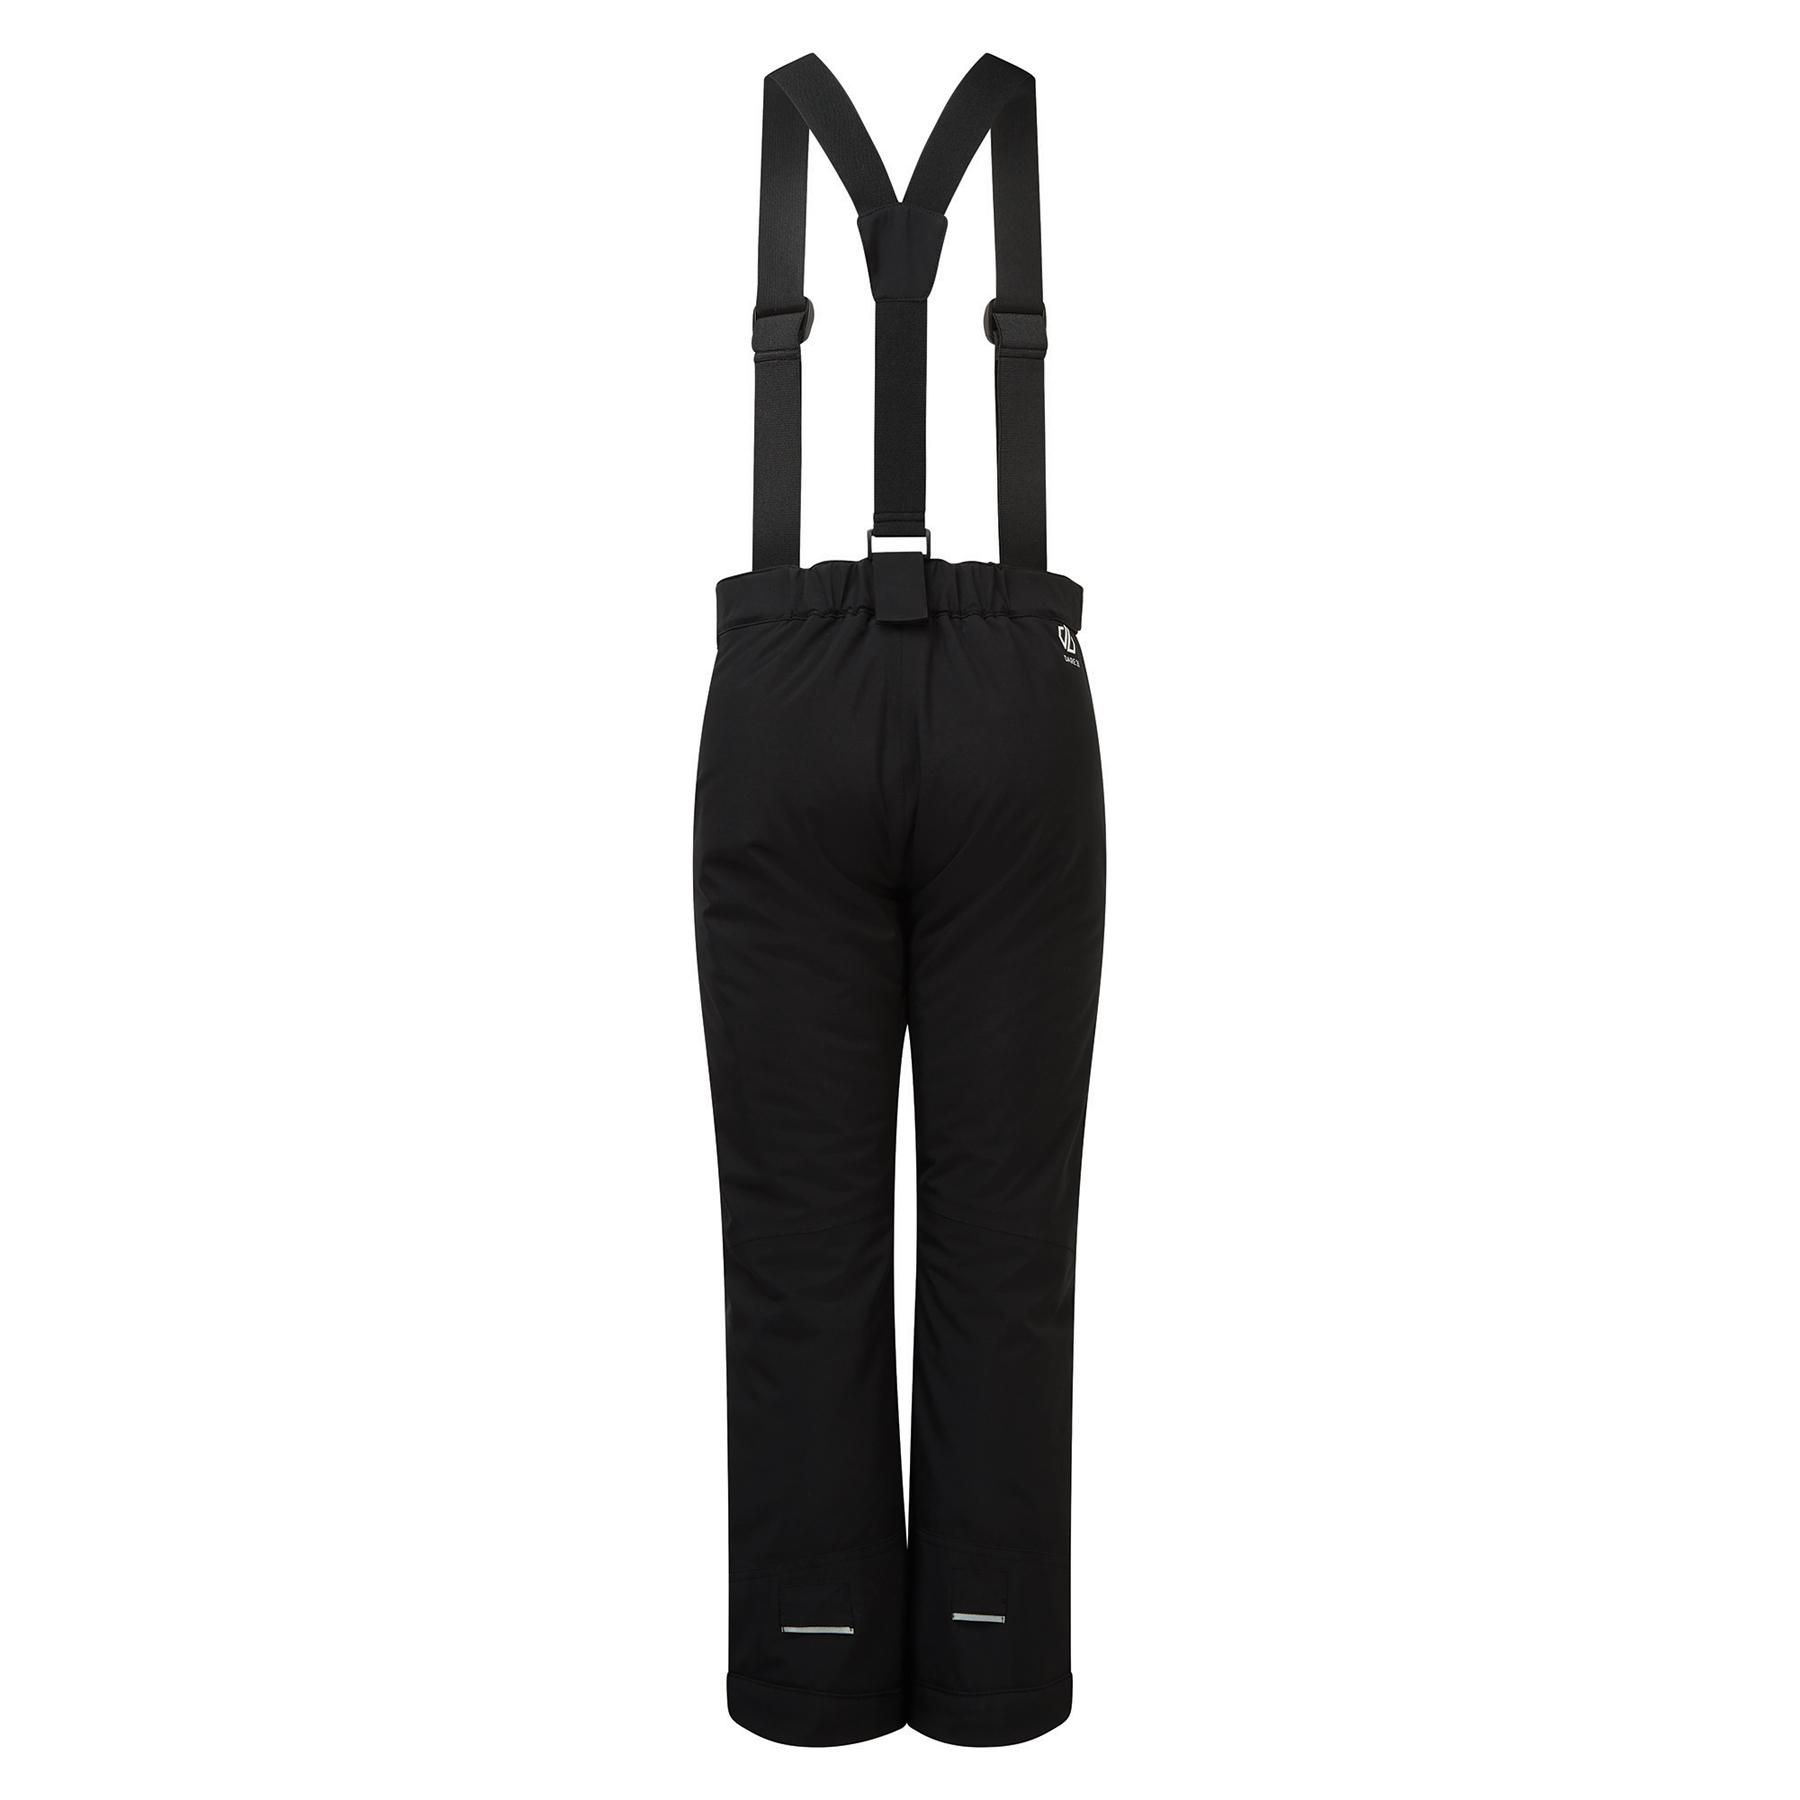 Image of Dare 2b Outmove II Pants Kids - 800 Black